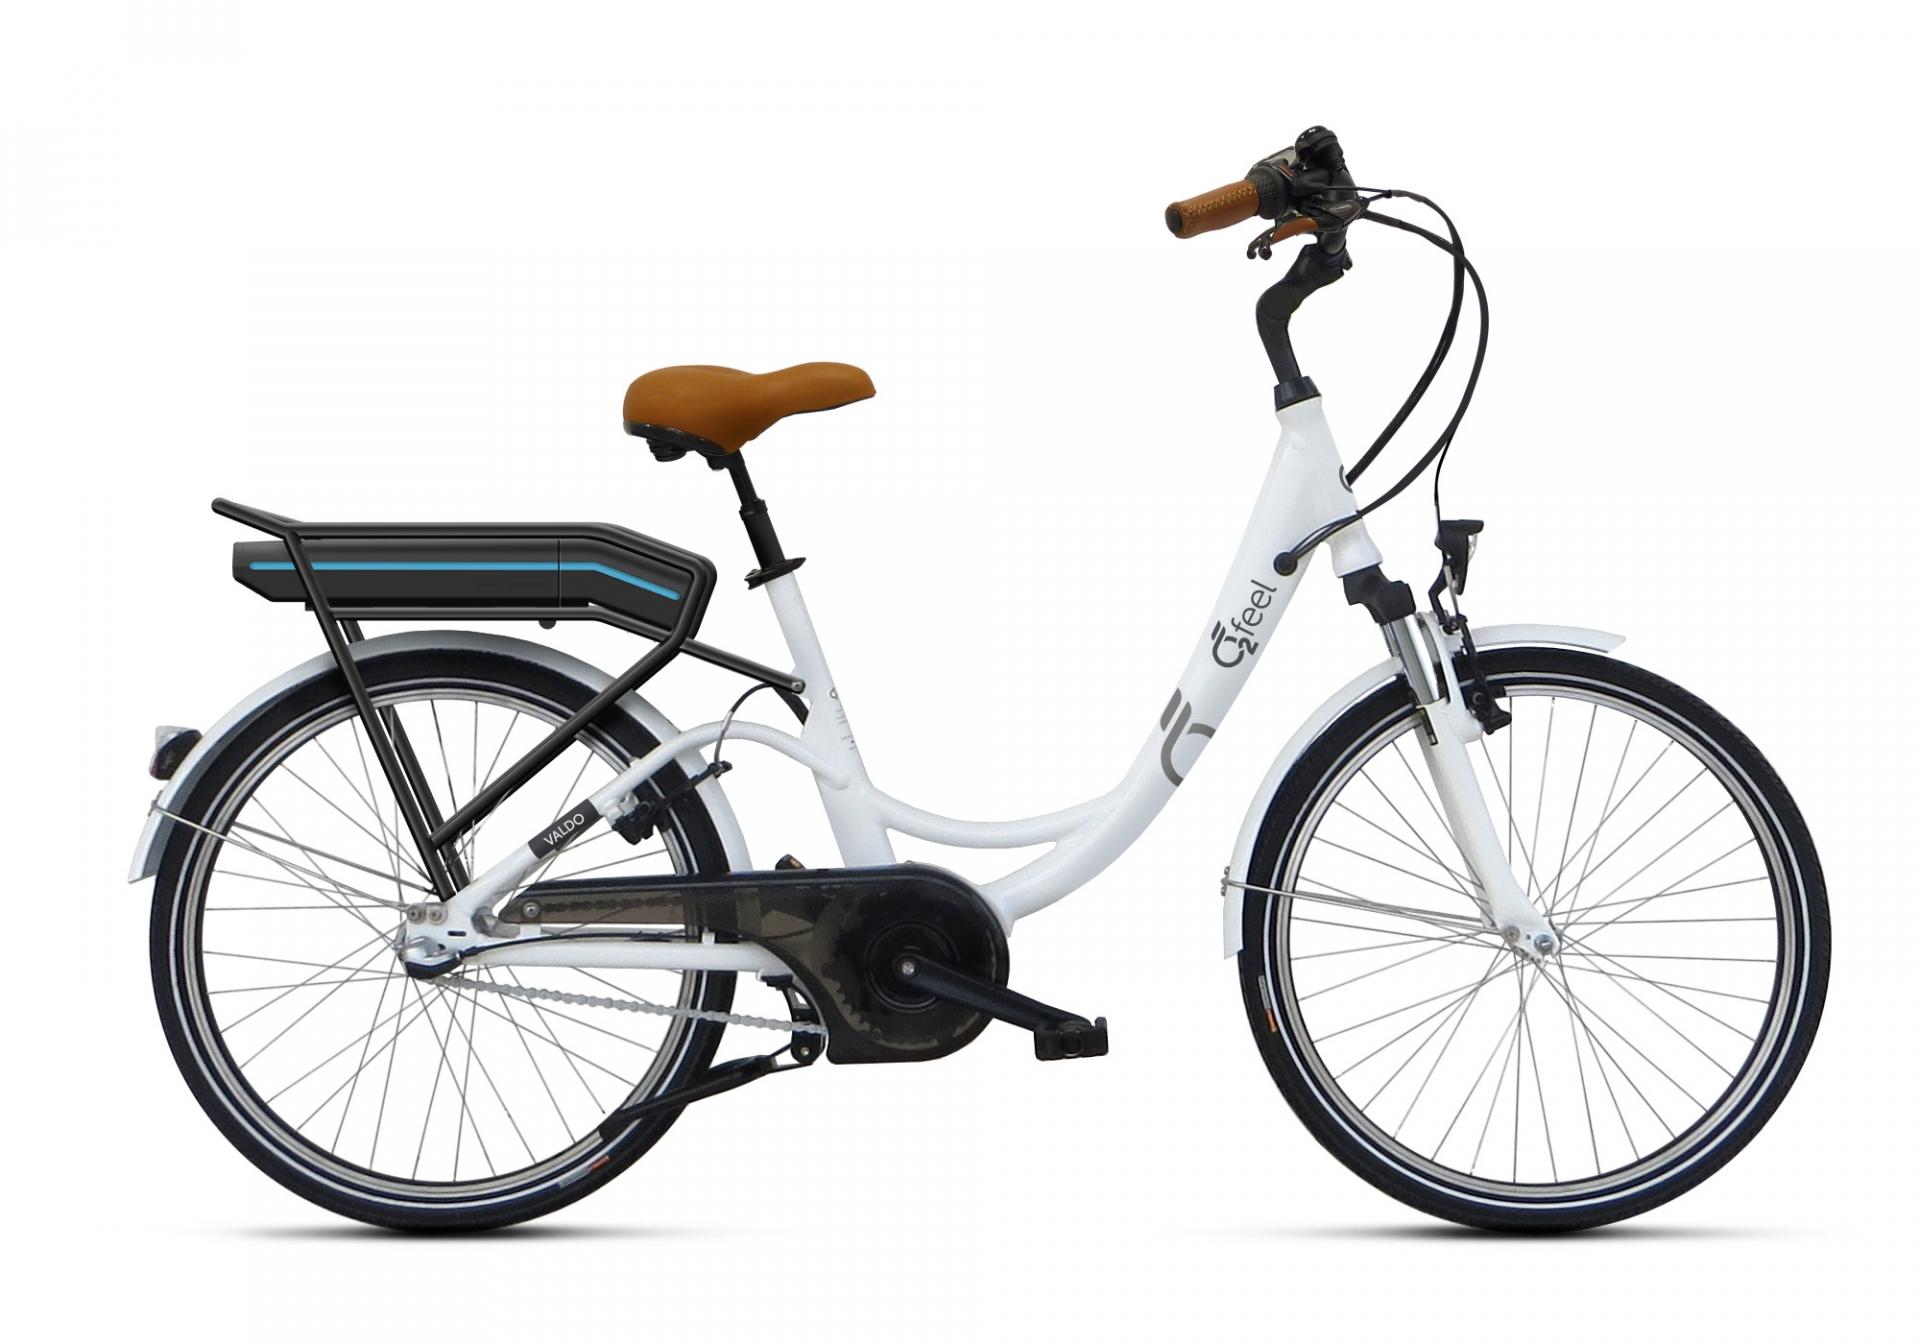 Vélo électrique O2Feel Valdo N3C 24 374 Wh Blanc